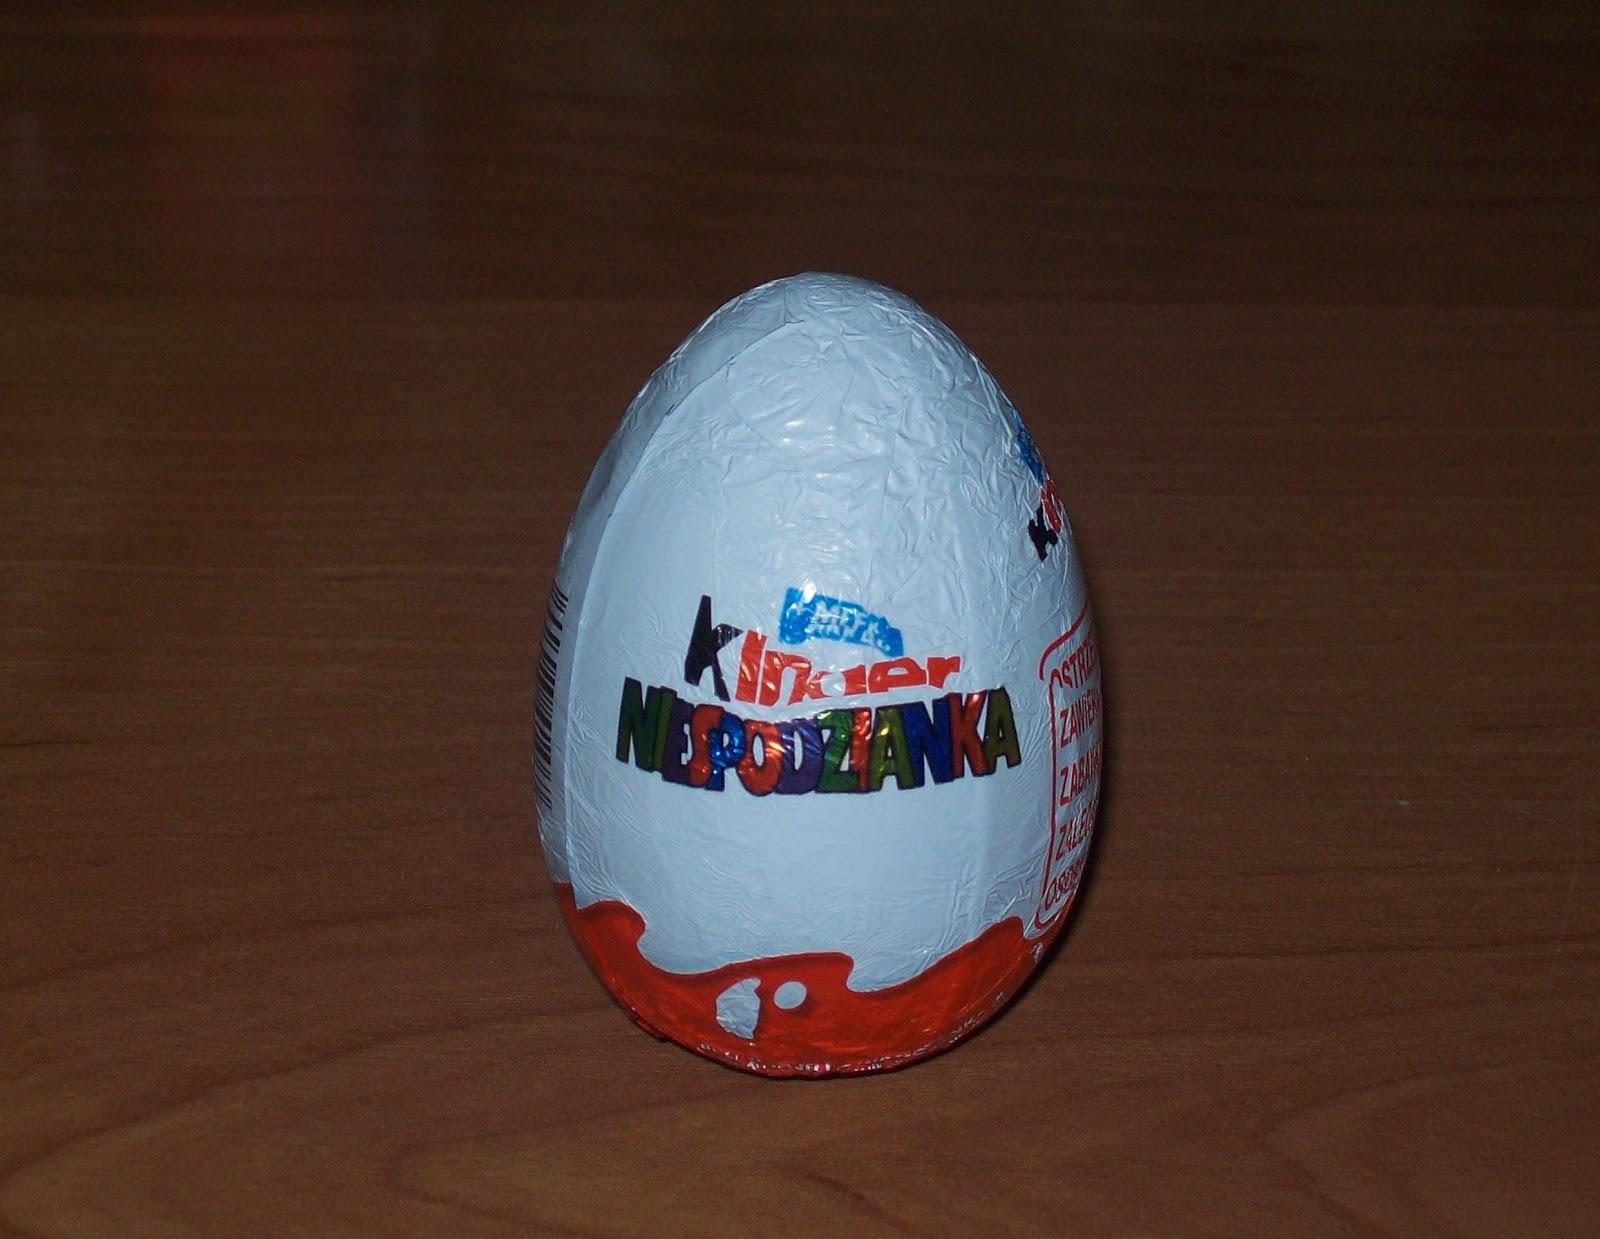 Kinder surprise , Magic Kinder,Kinder Joy, zabawki, figurki kolekcja, kinder czekoladakinder jajko niespodzianka, kinder czekolada, kolekcje z kinder niespodzianki, kinder niespodzianka kolekcje